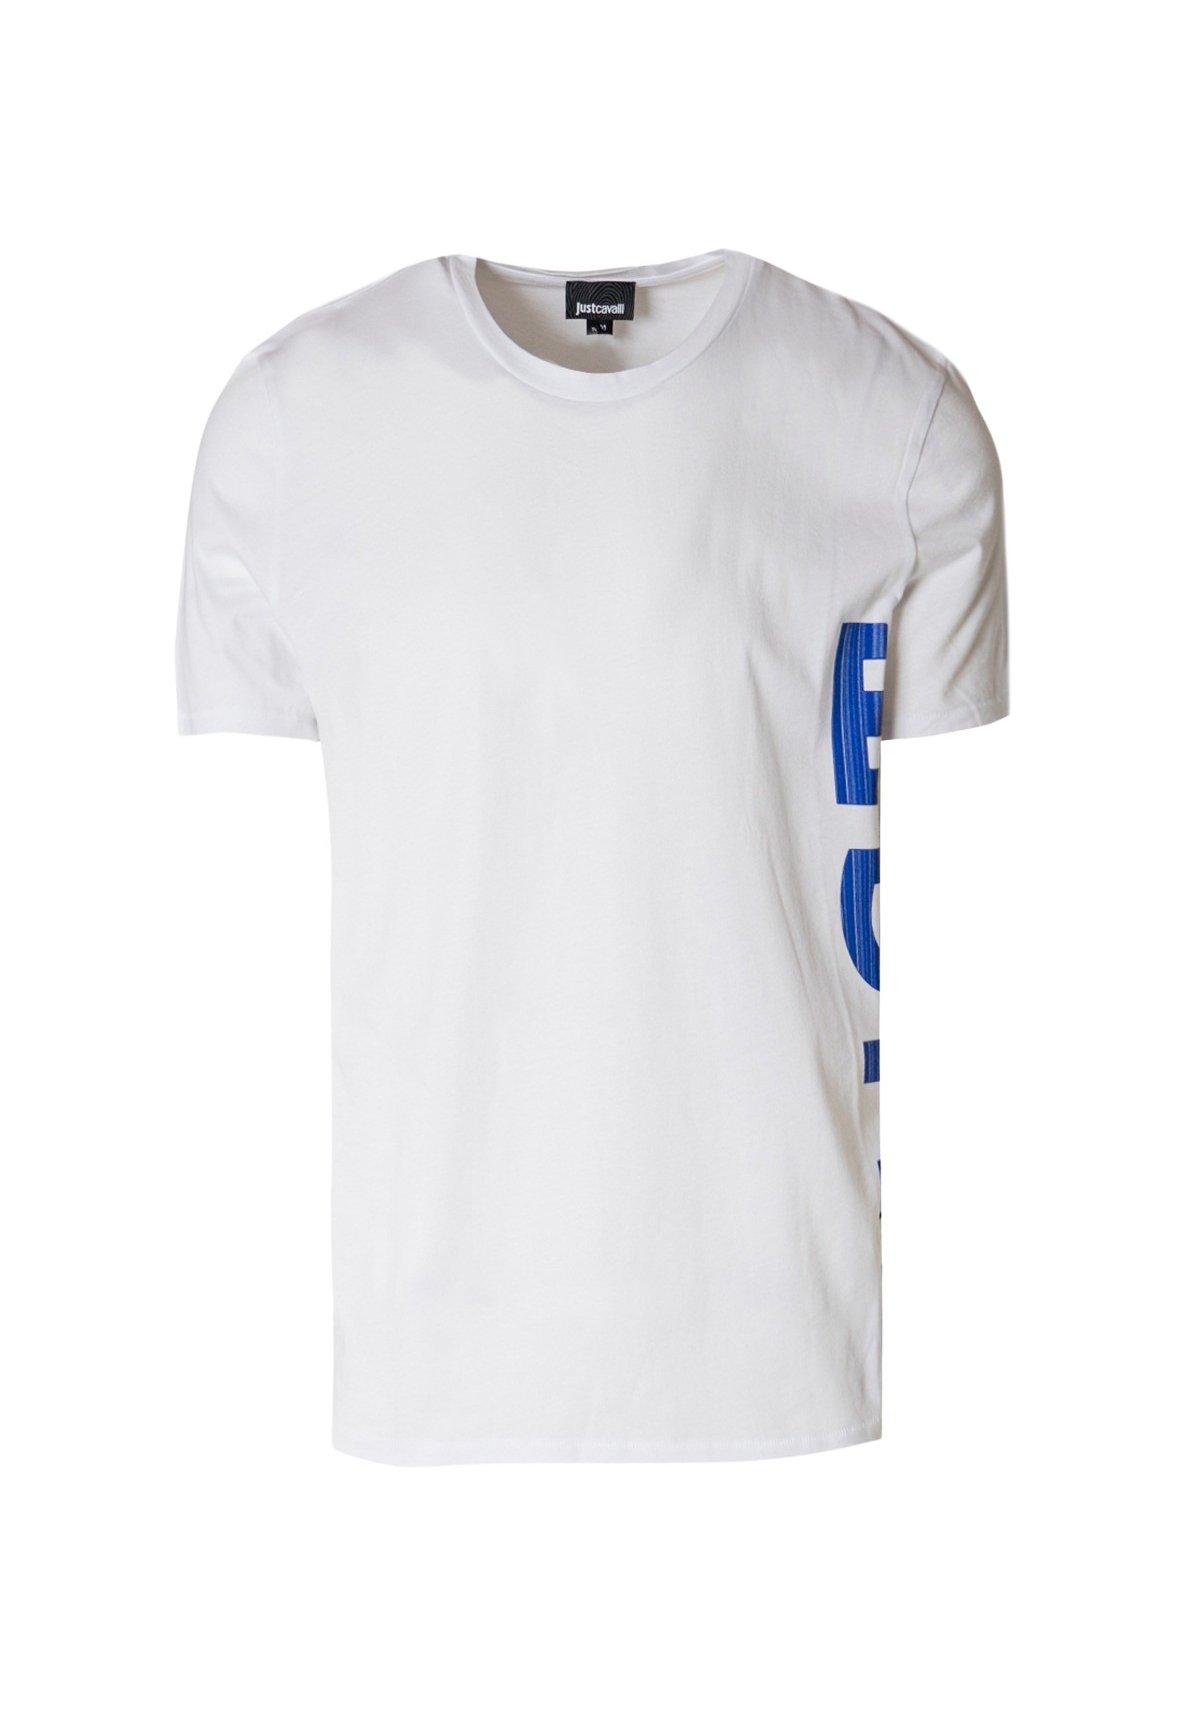 Uomo T-shirt con stampa